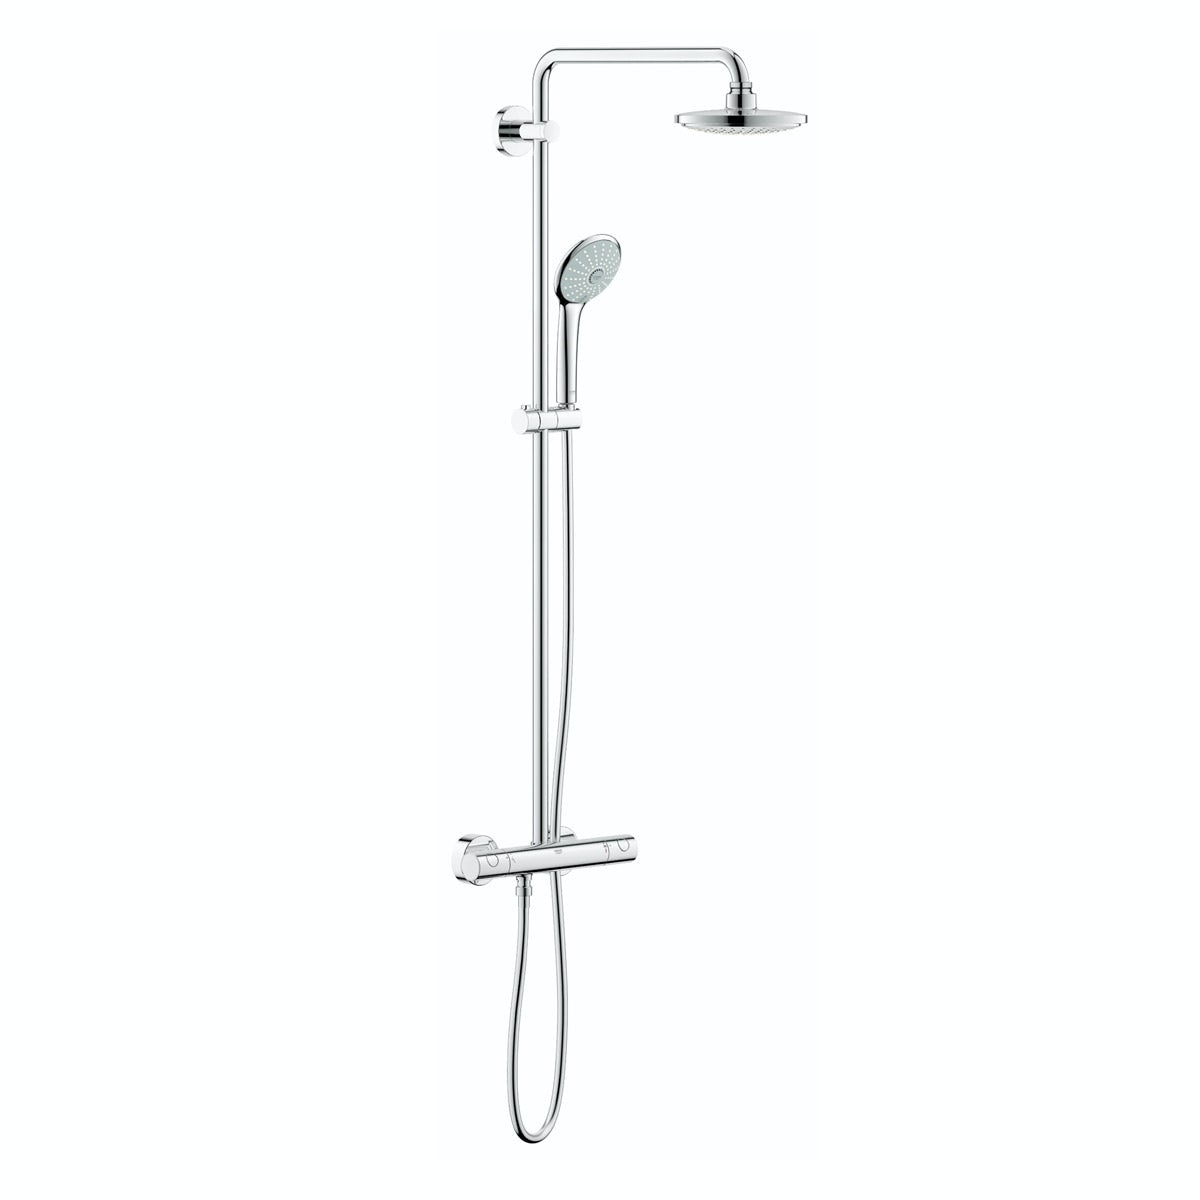 grohe euphoria 180 cosmopolitan shower system. Black Bedroom Furniture Sets. Home Design Ideas